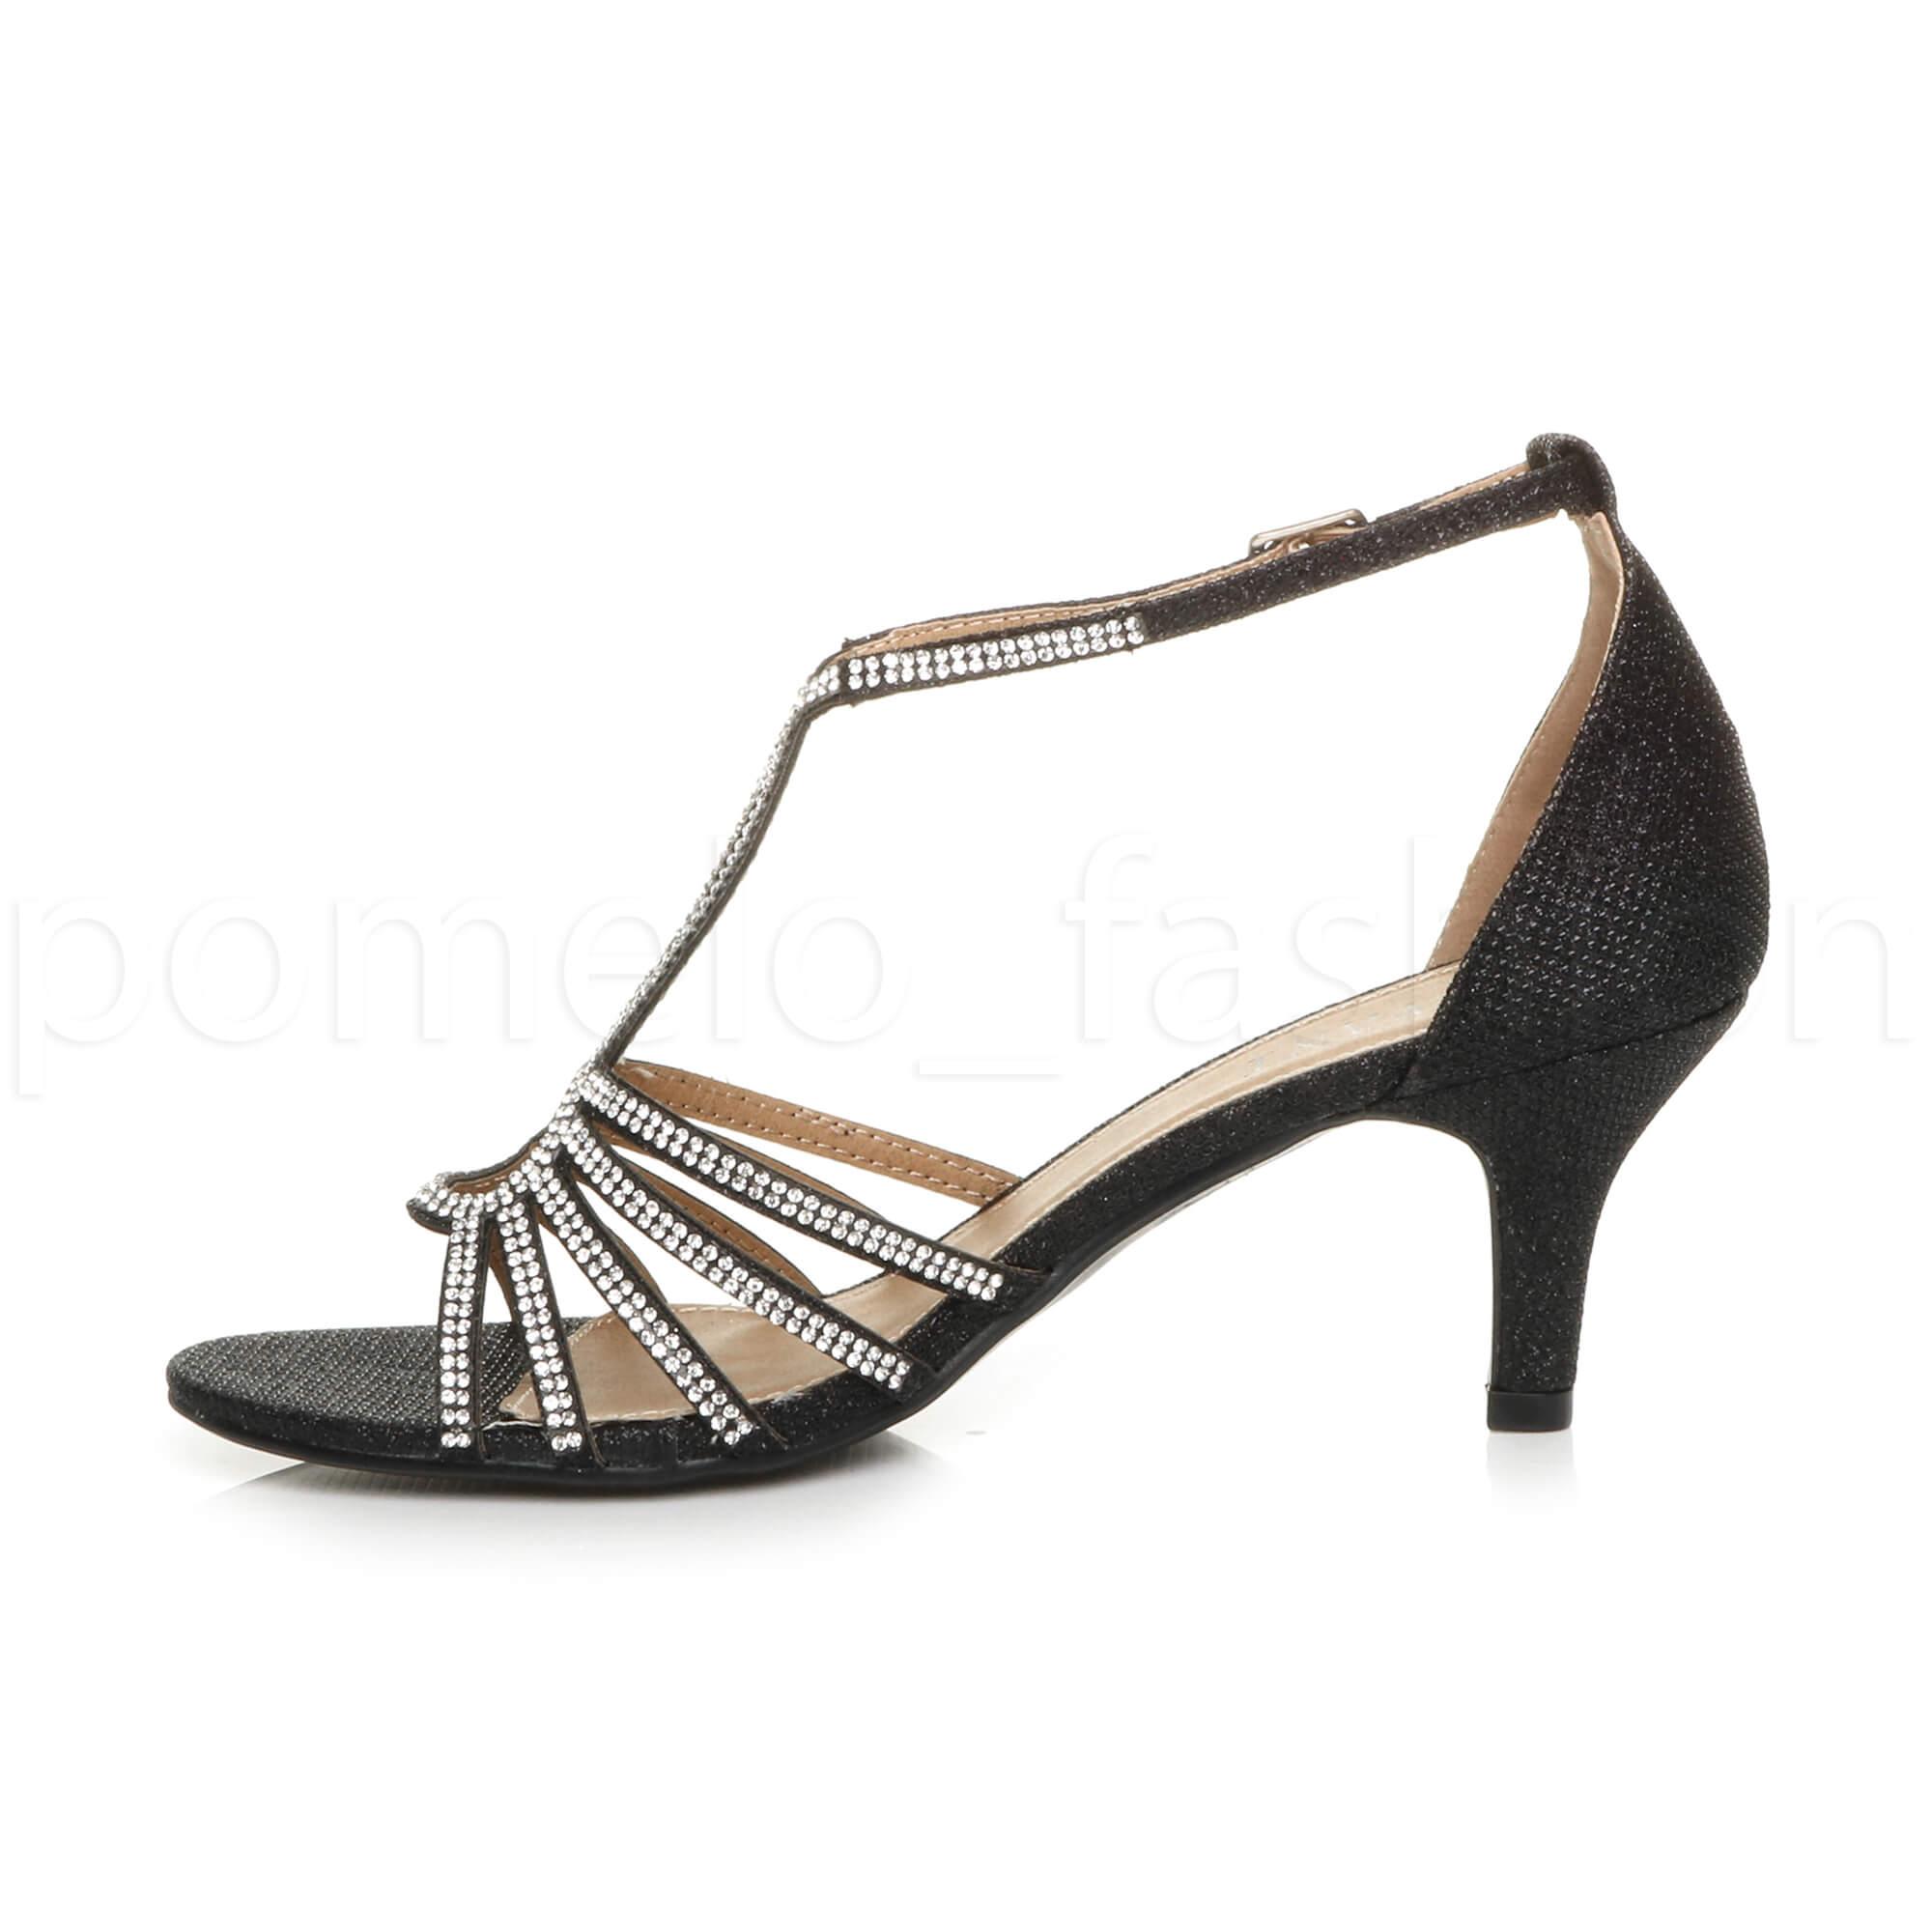 womens mid heel gems glitter strappy bridal cut out